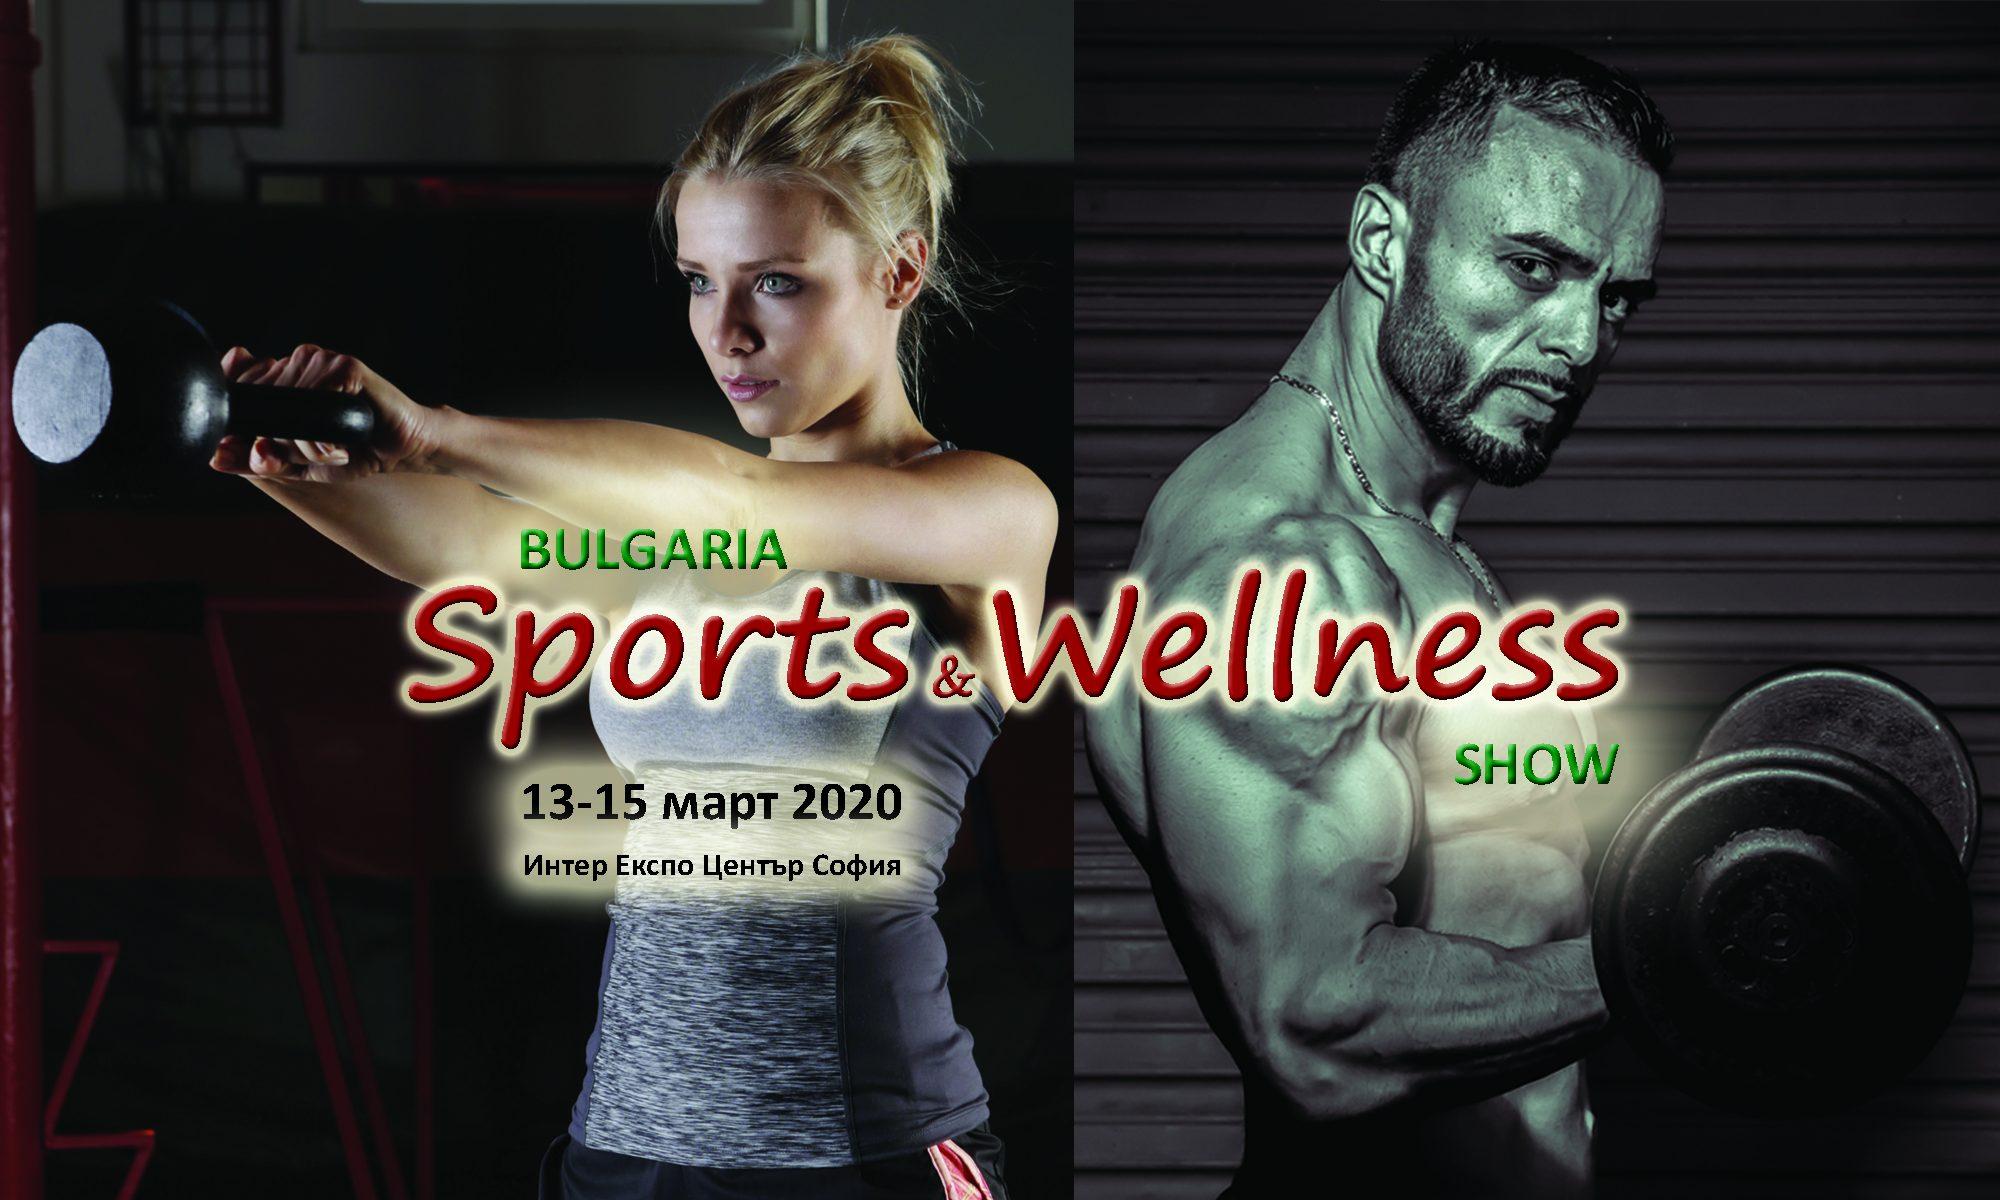 Bulgaria Sports & Wellness Show